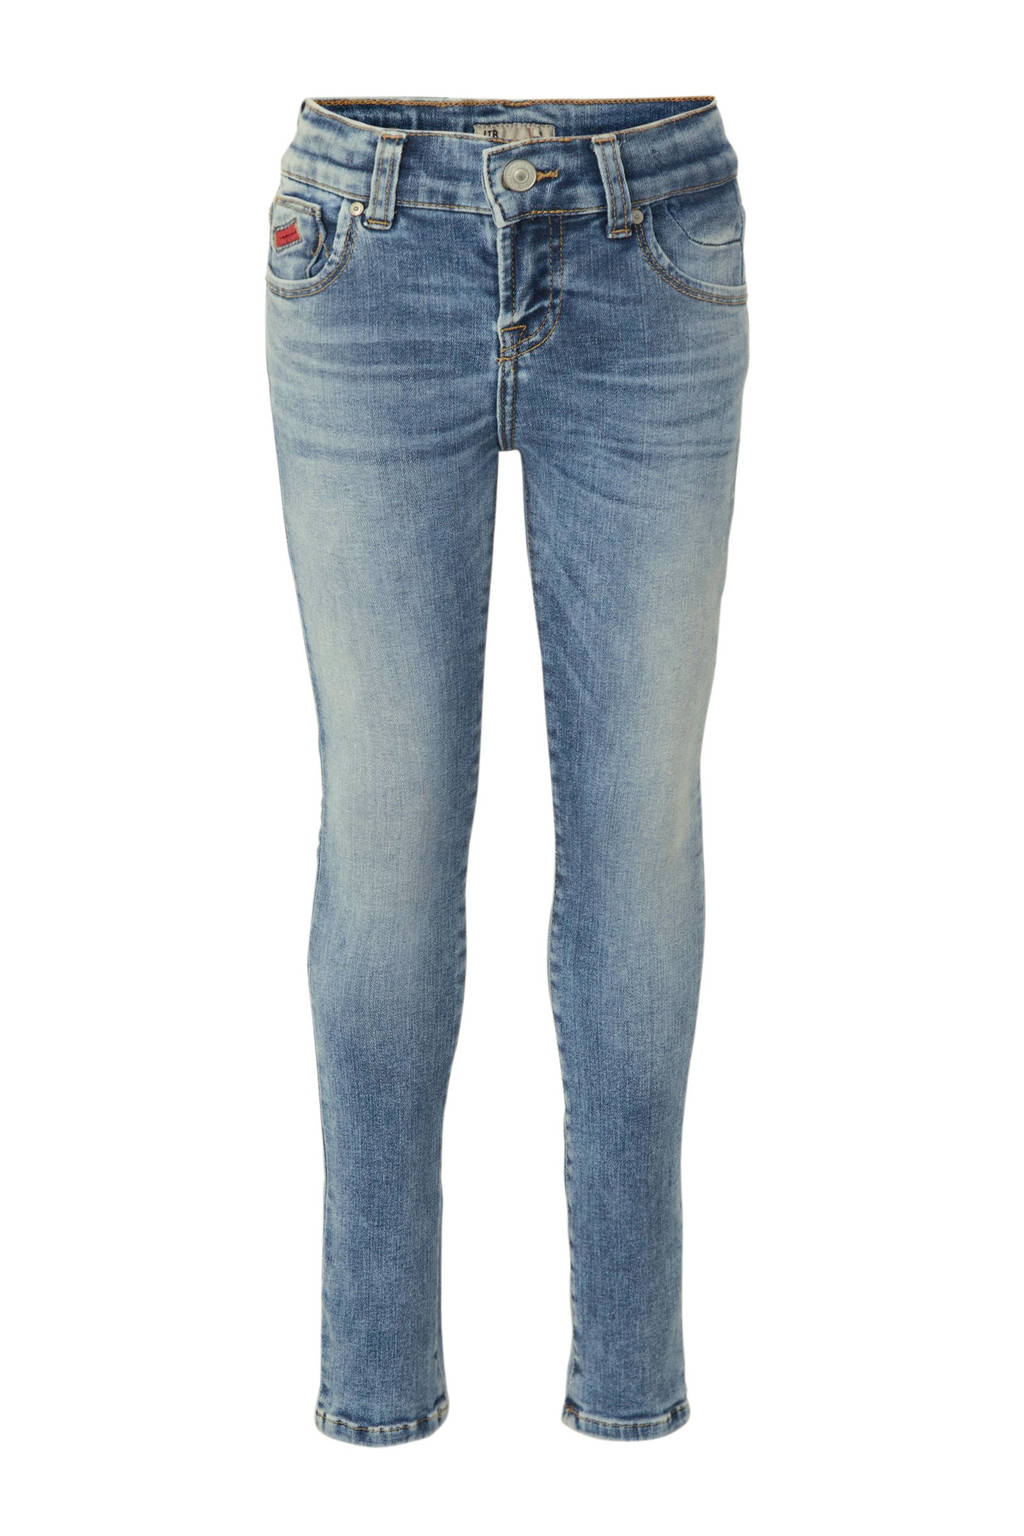 LTB skinny fit jeans Ravi lichtblauw, Lichtblauw (Etu wash)